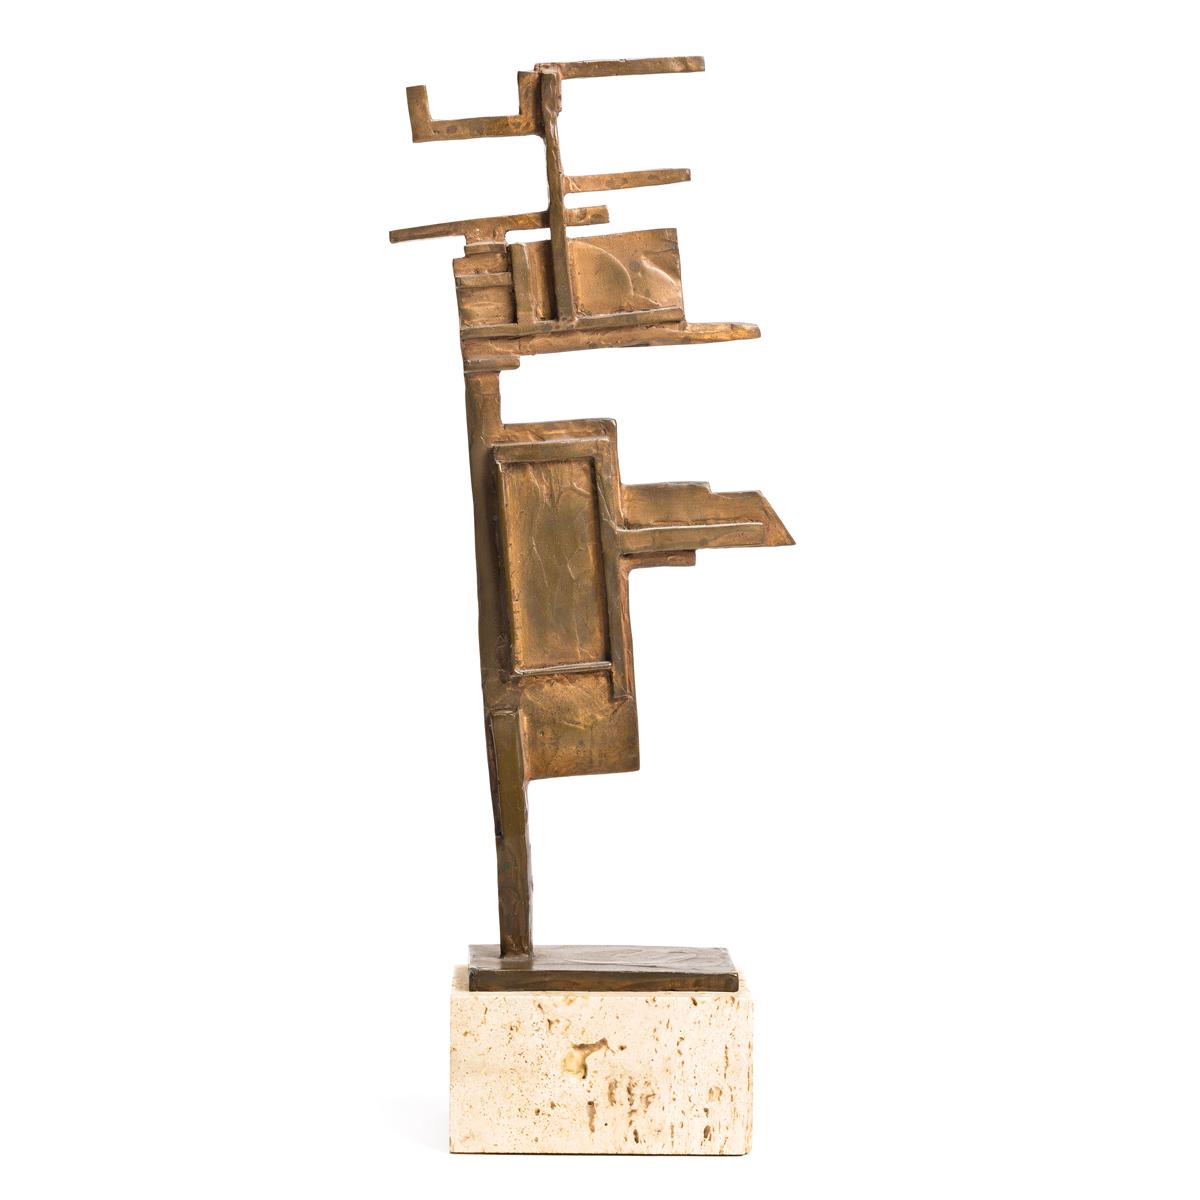 DOROTHY DEHNER (1901 - 1994, AMERICAN) Untitled.